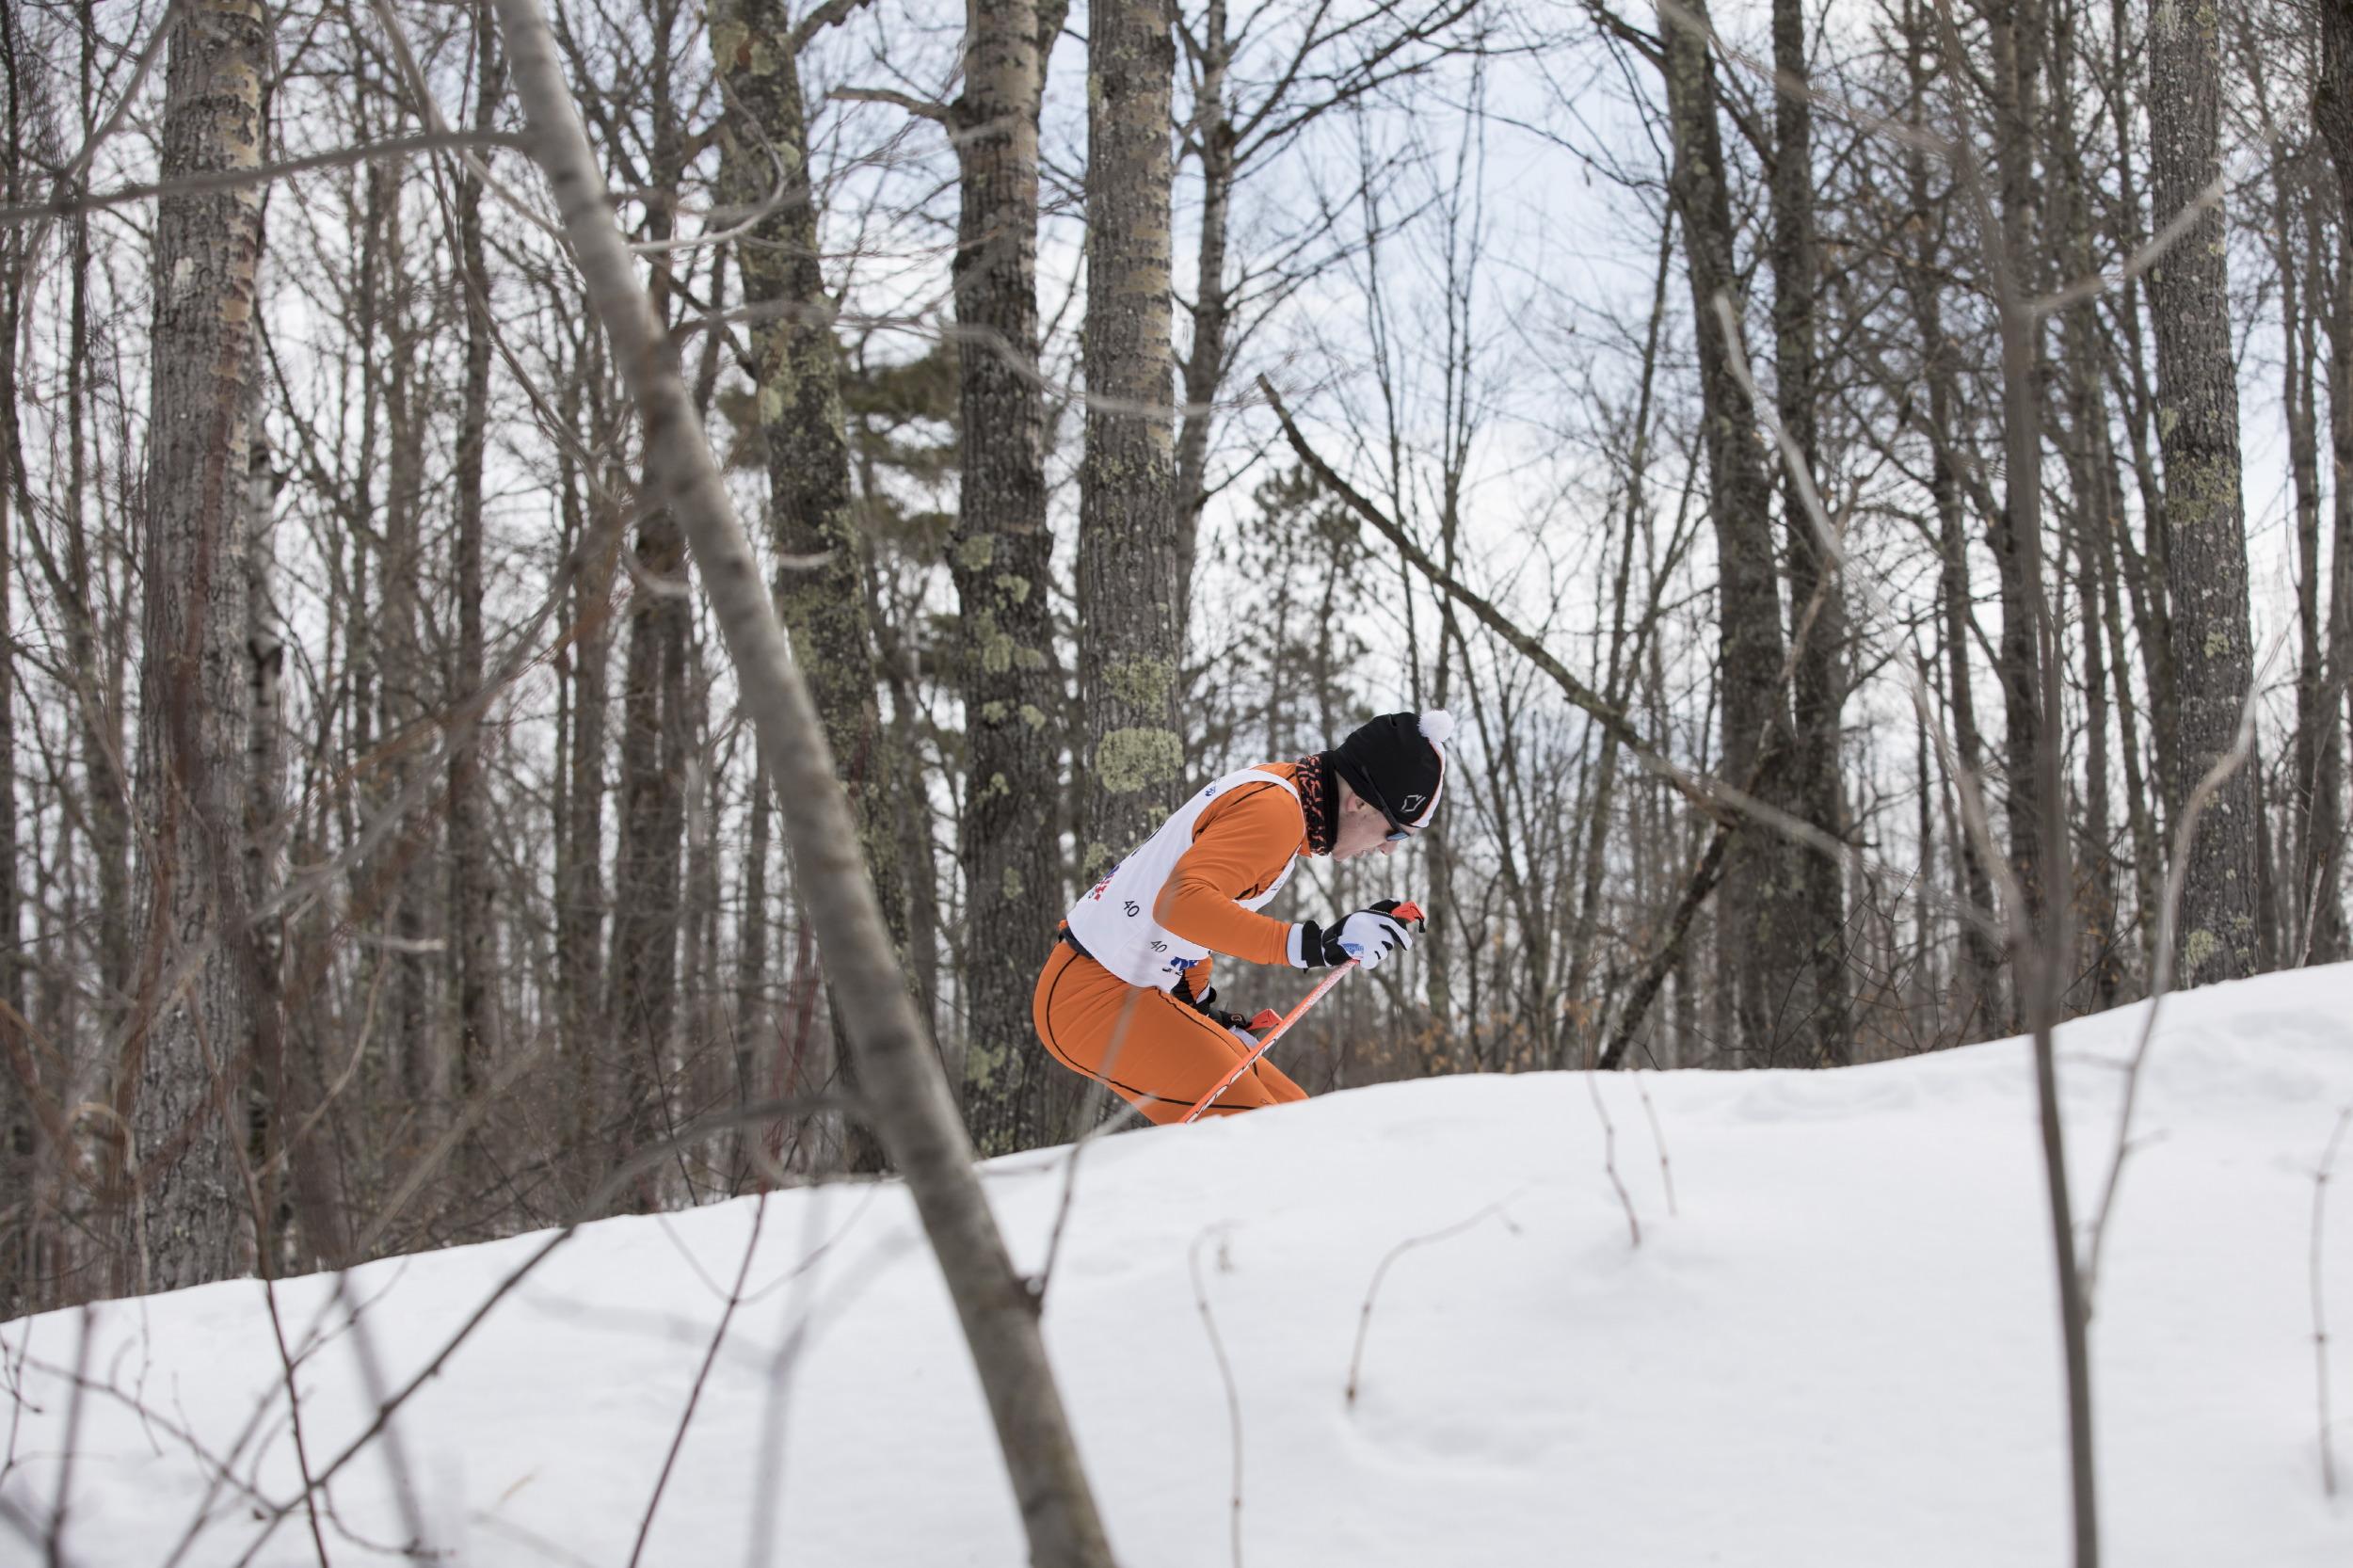 AckermanGruber_Skiing_12.JPG